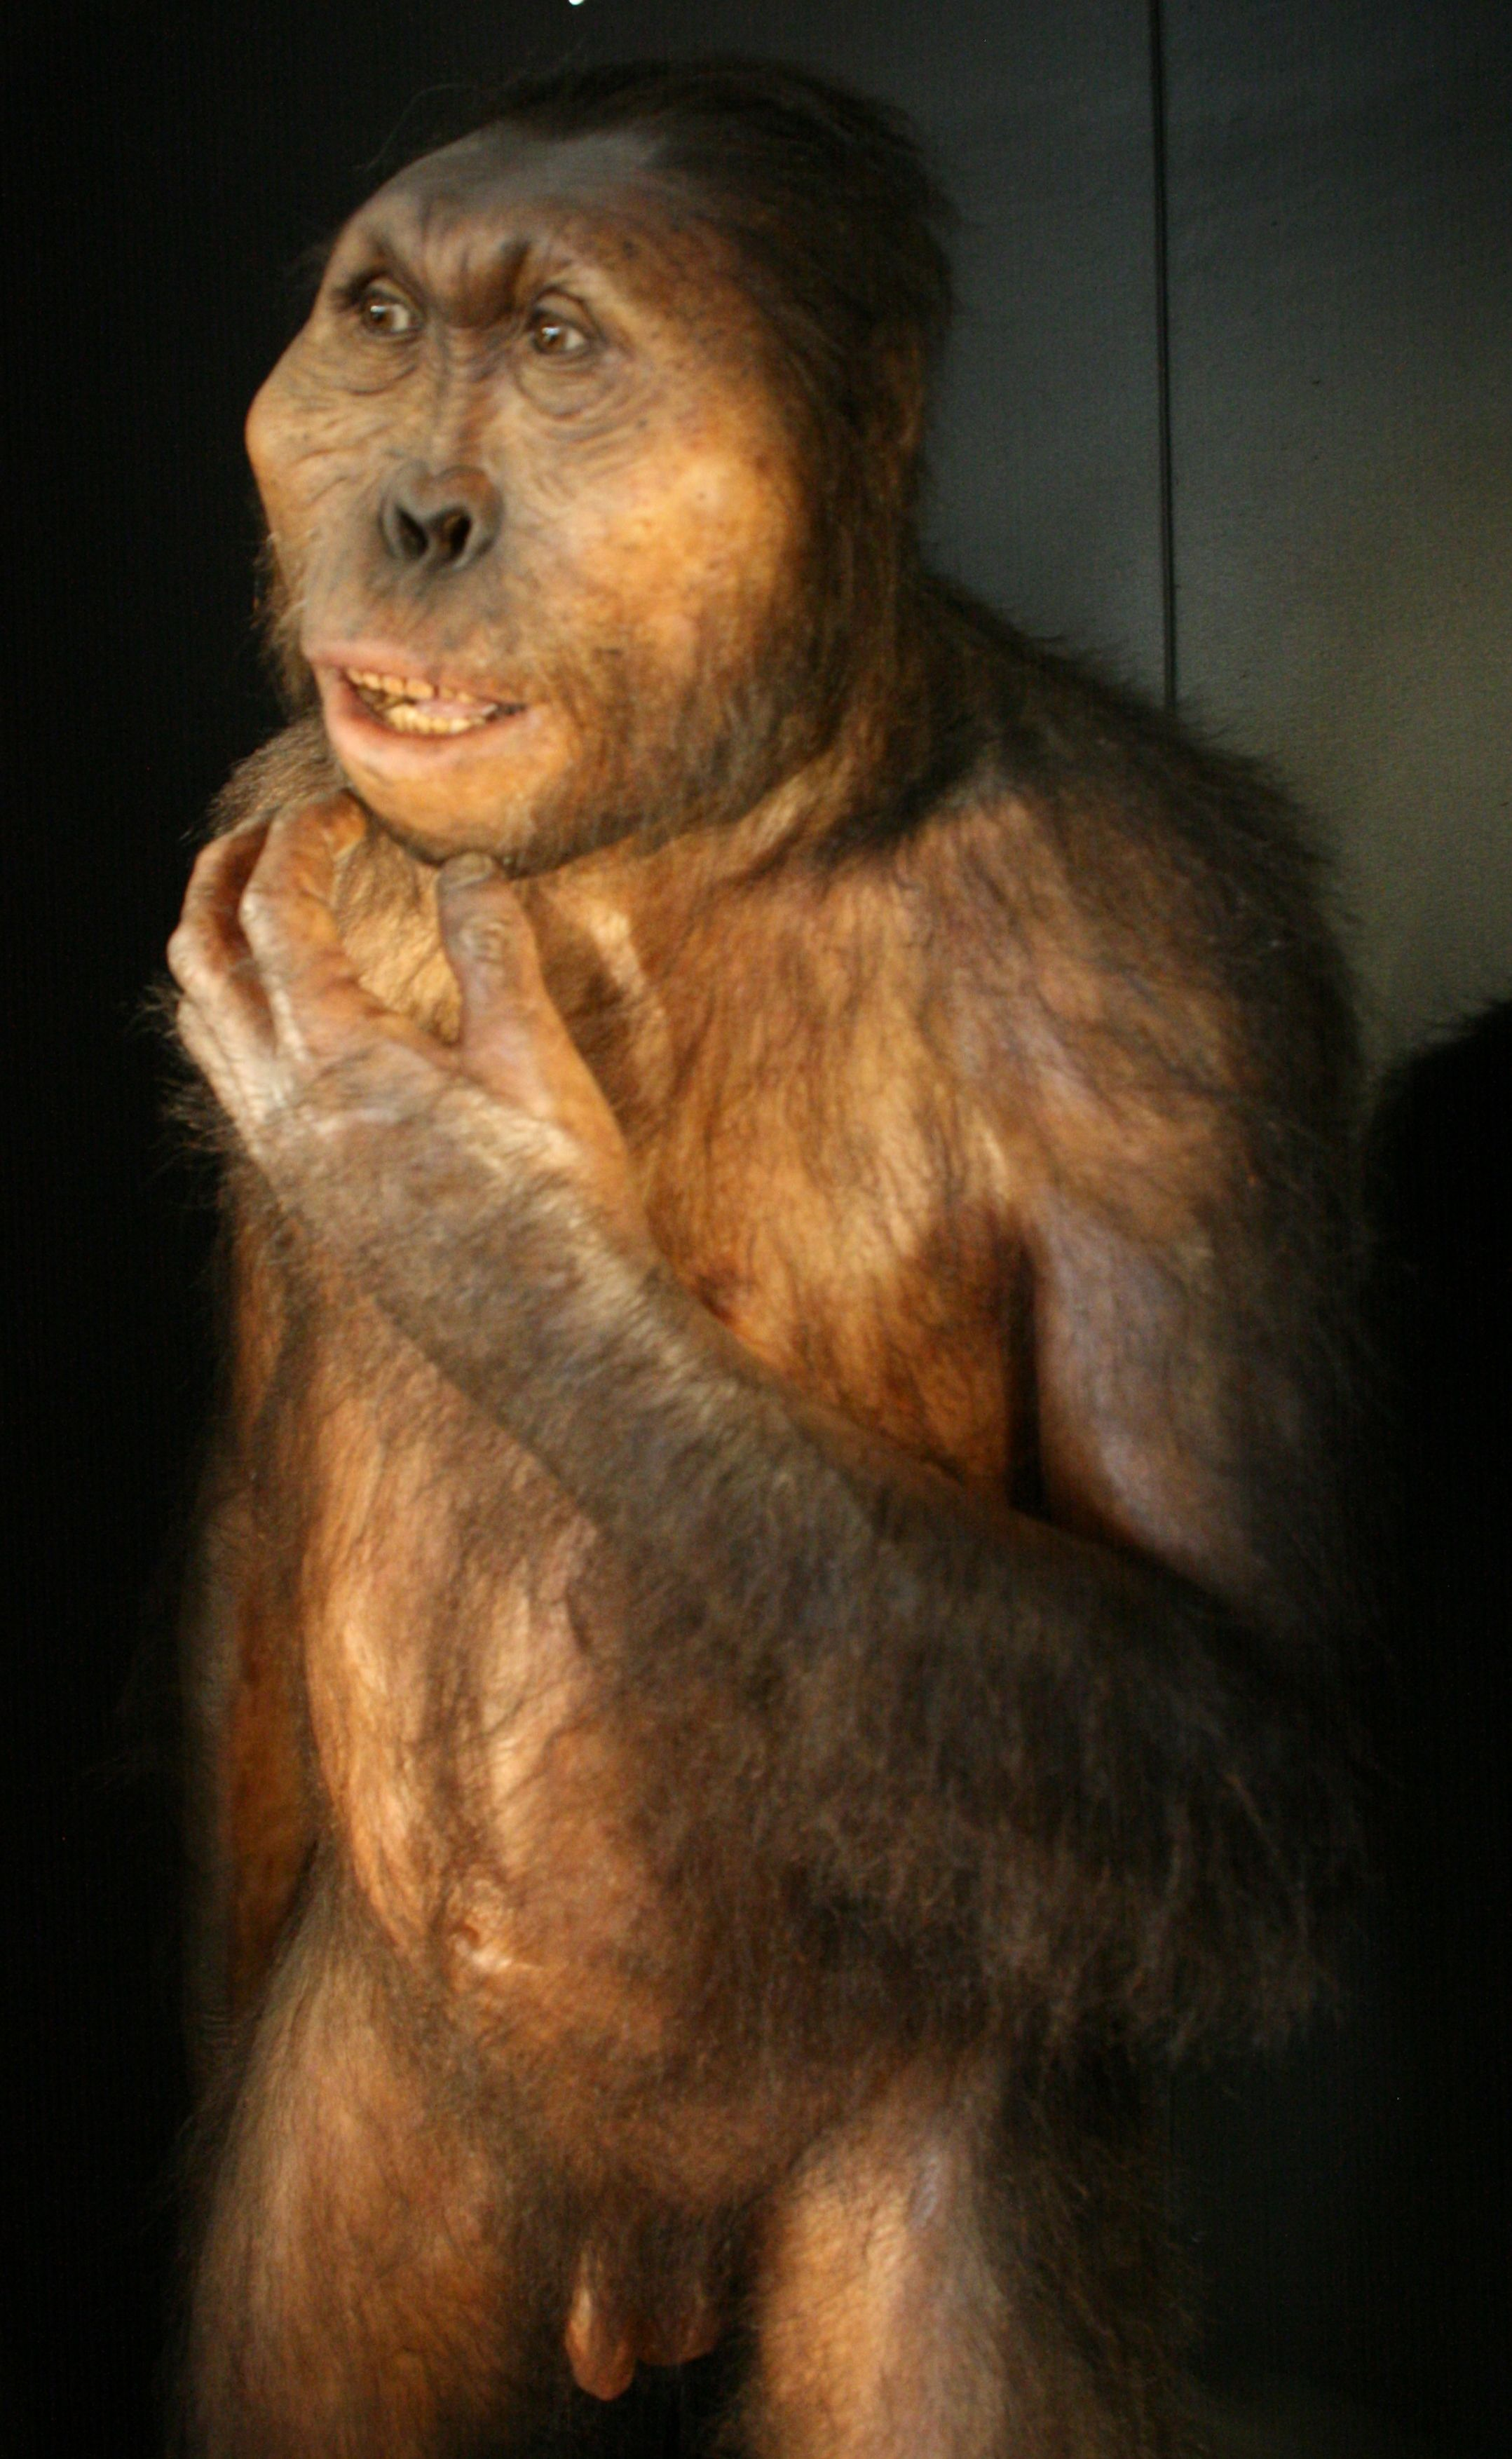 Australopithecus africanus taung child dating 6